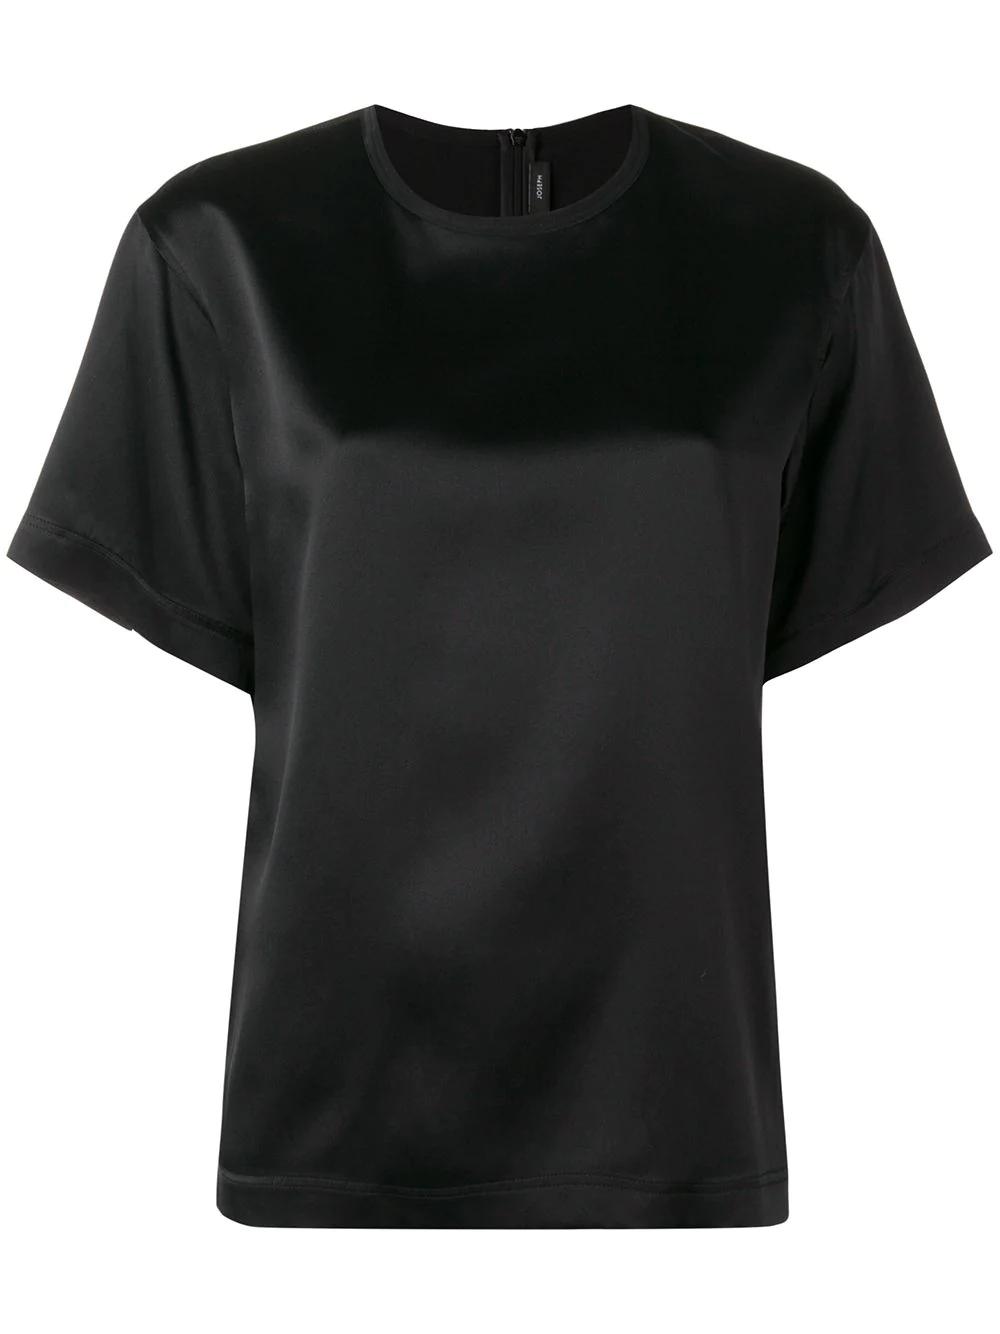 c15f6aa2eb2b Joseph T-Shirt Aus Satin - Schwarz In Black | ModeSens